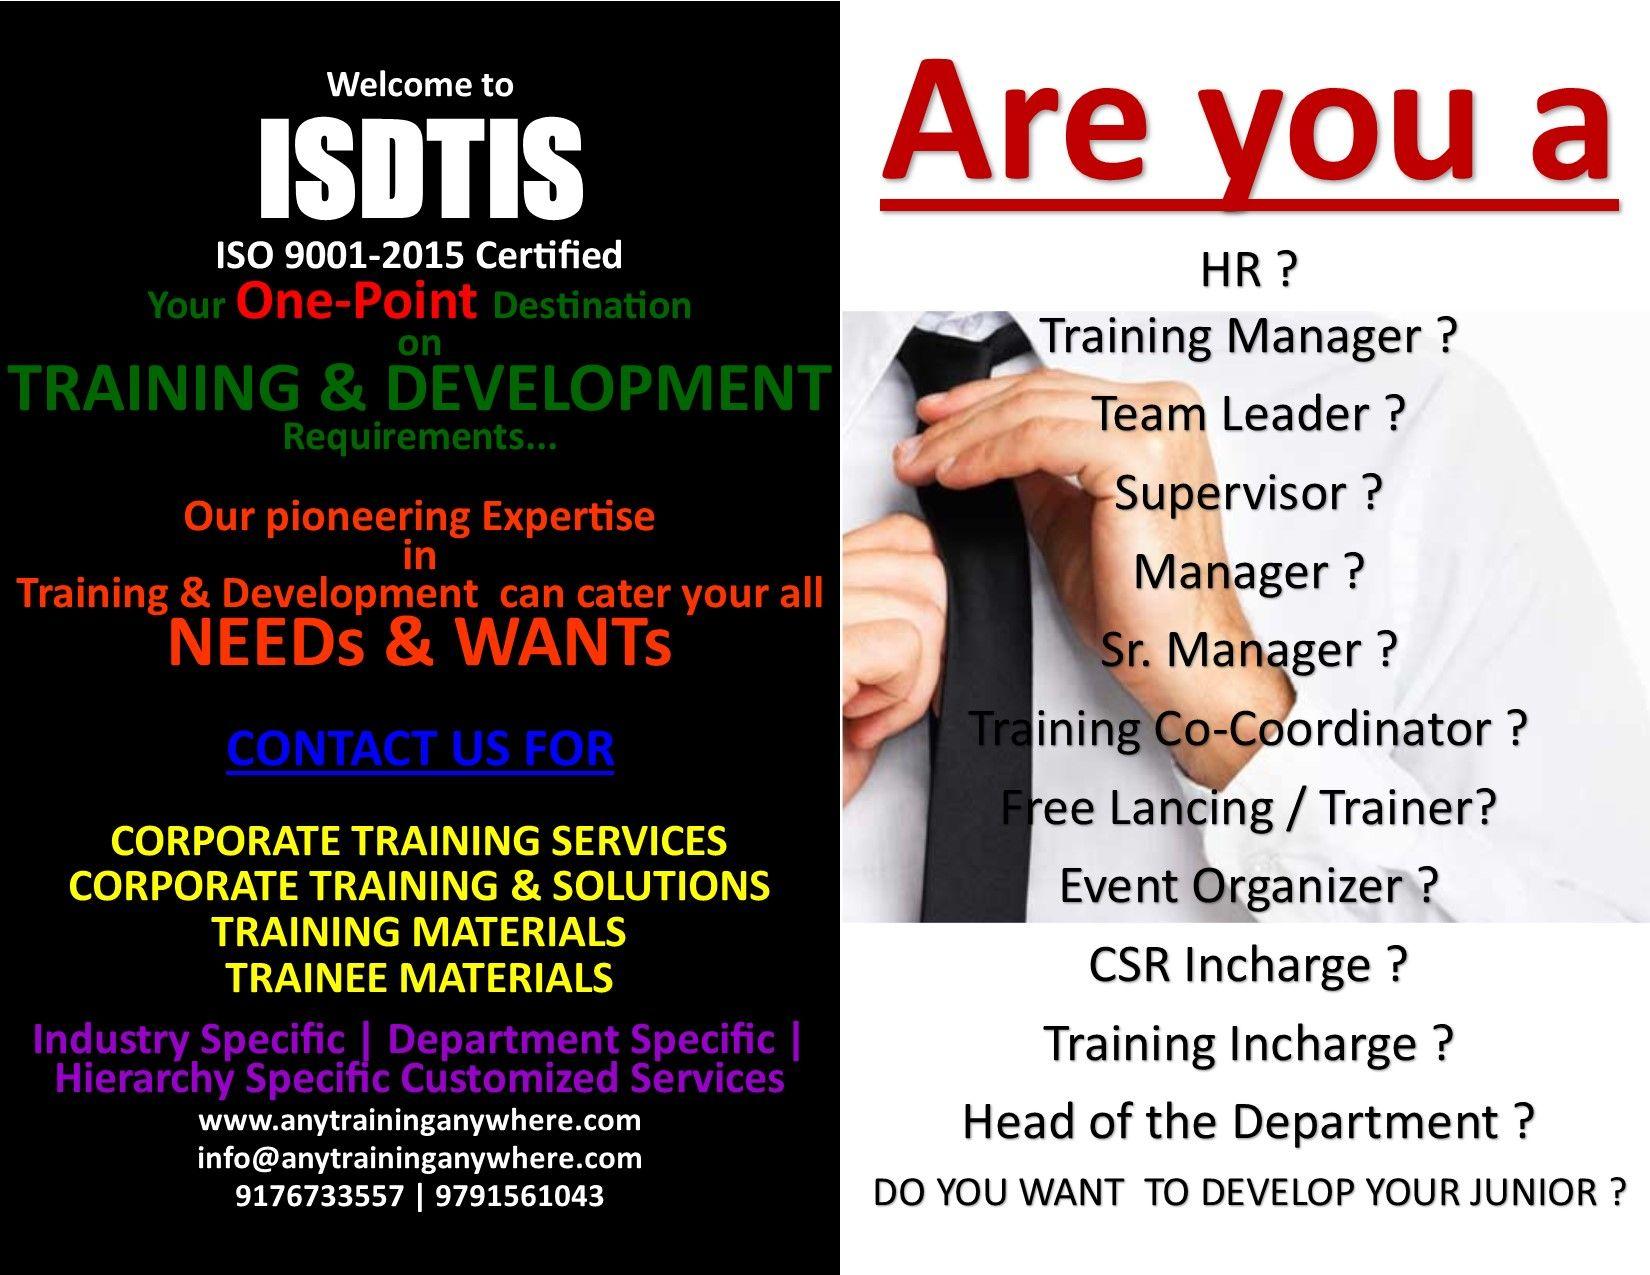 hr training manager team leader supervisor manager sr team leader supervisor manager sr manager